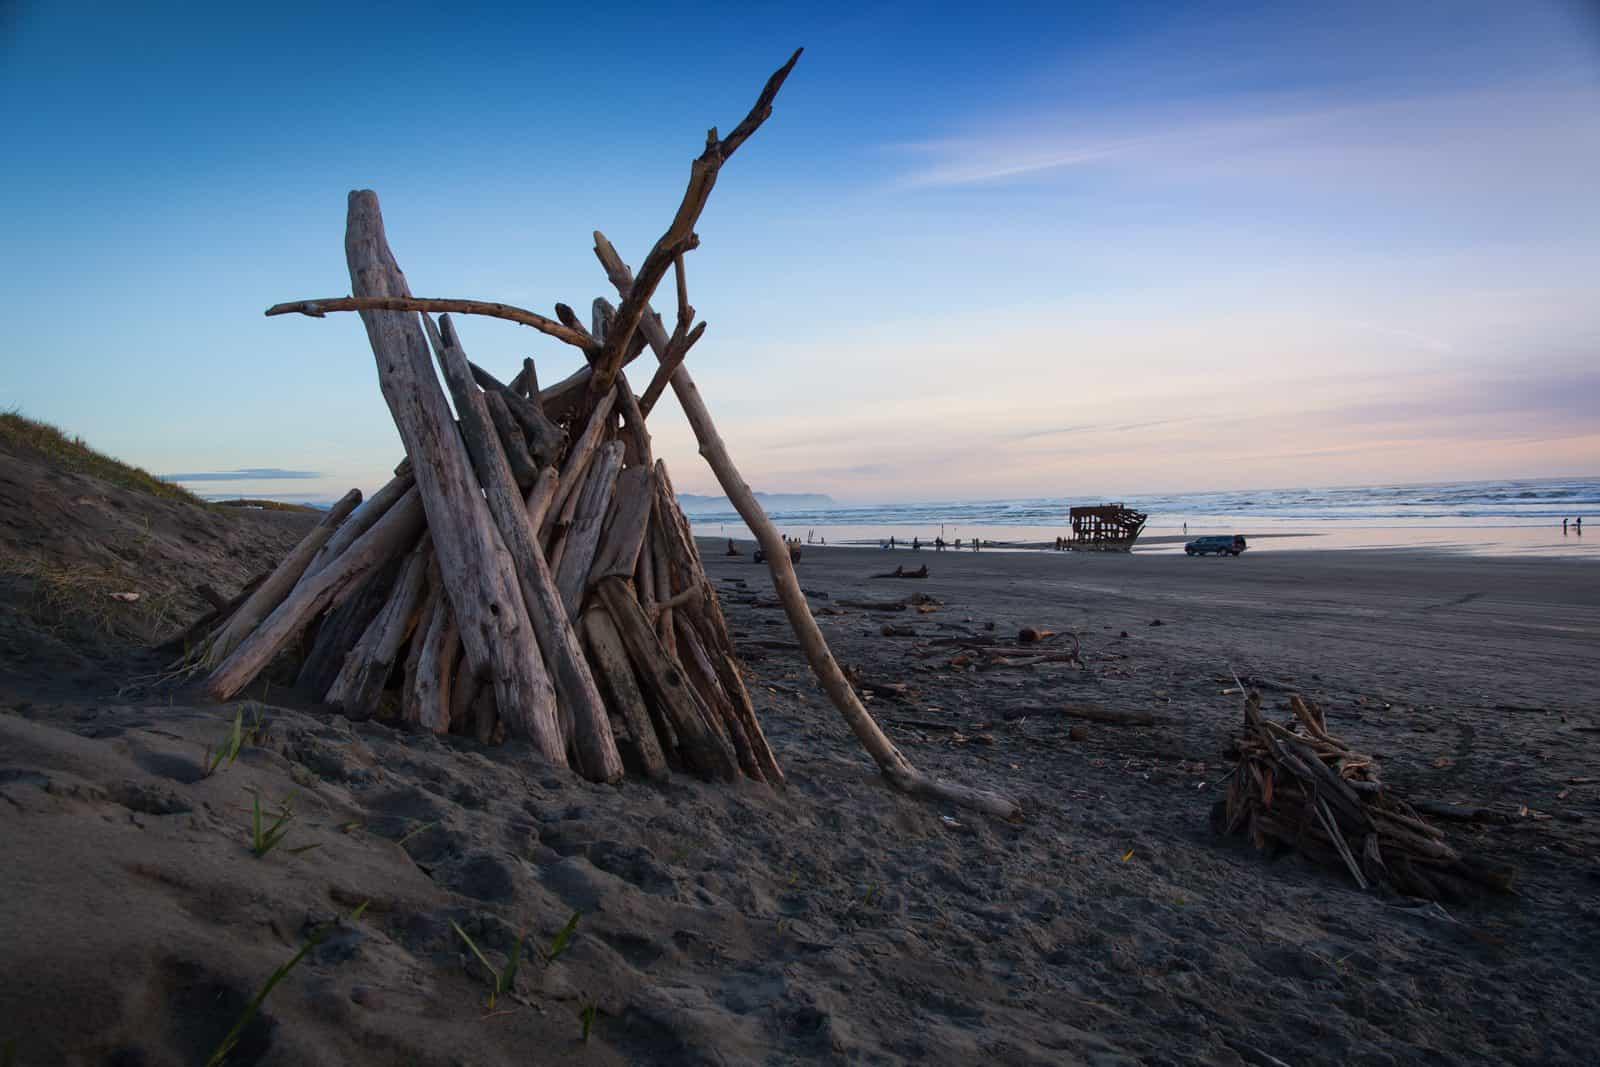 peter-iredale-shipwreck-fort-stevens-park-oregon 5616x3744